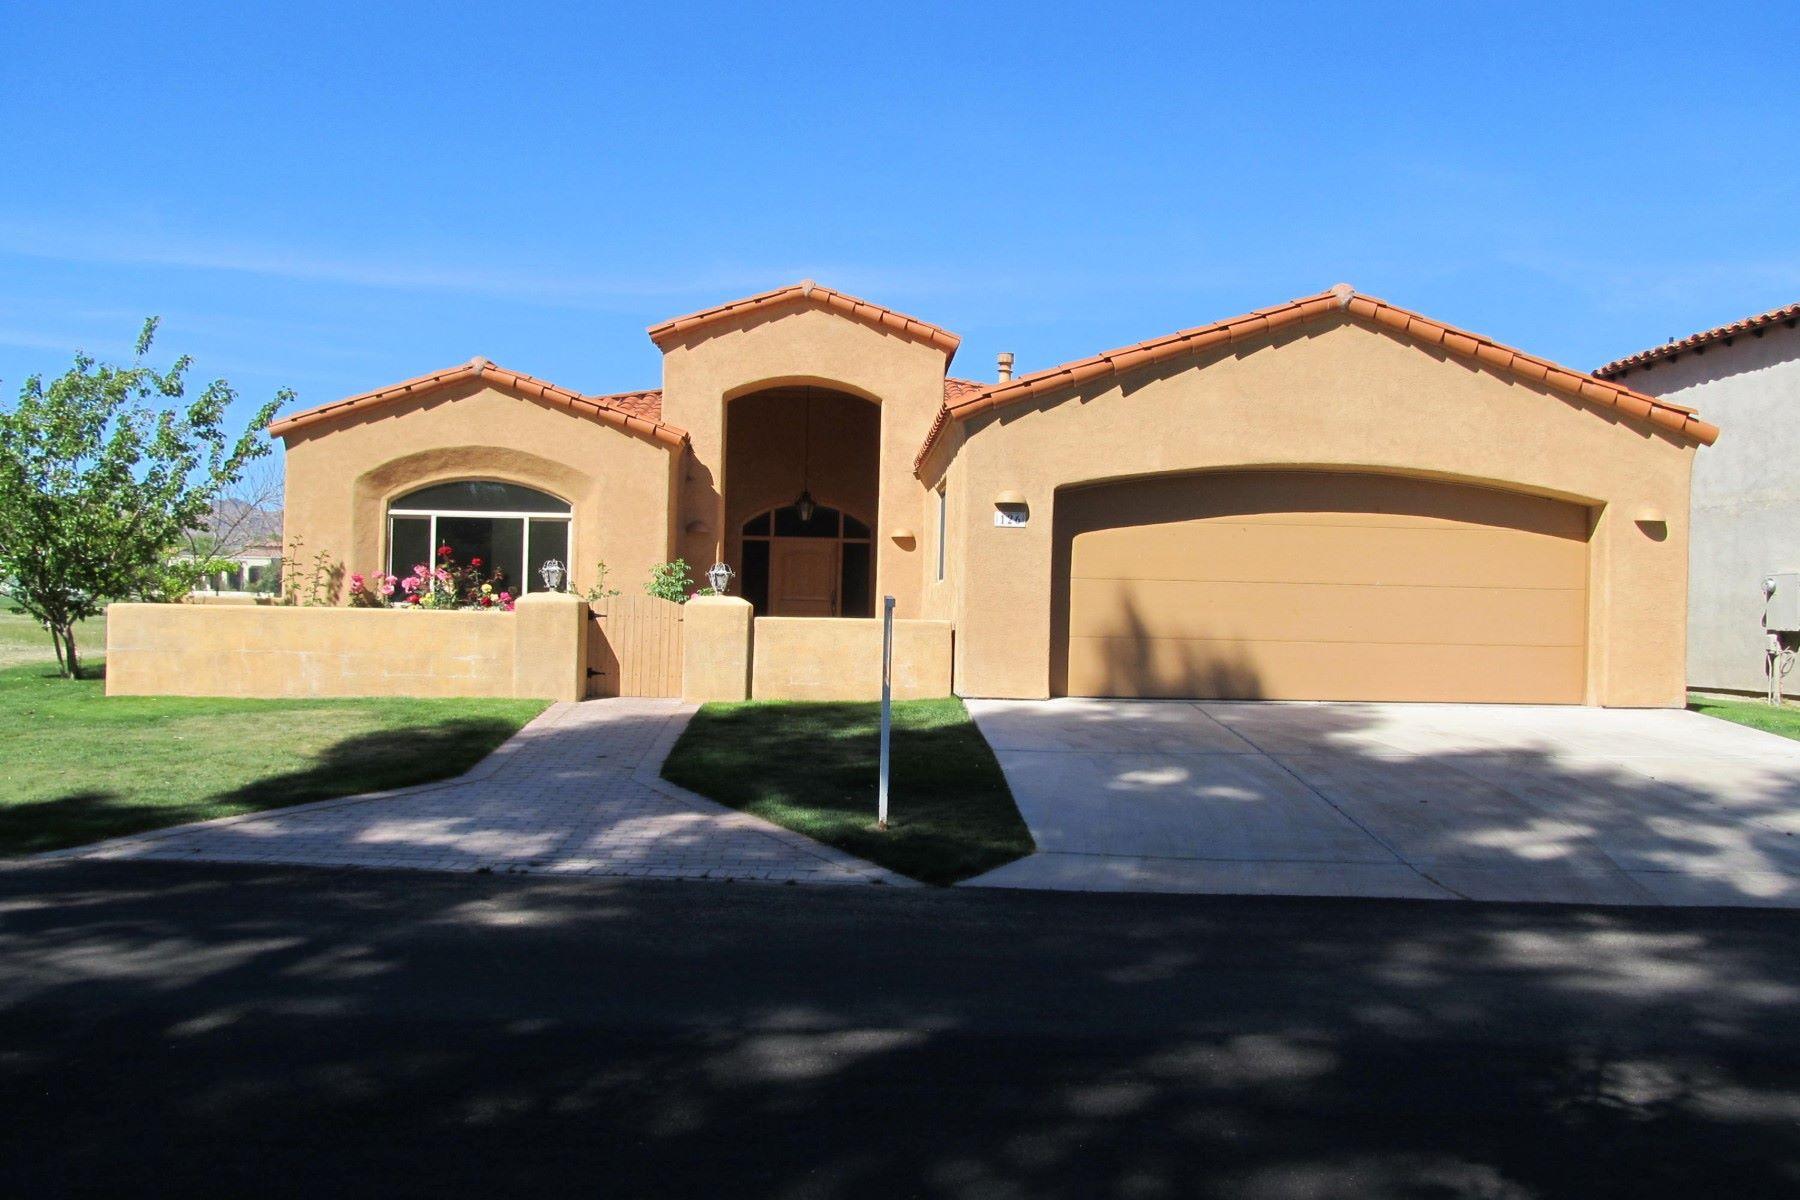 Single Family Home for Sale at Beautiful custom home in the renowned Tubac Golf Resort 126 Avenida De Otero Tubac, Arizona, 85646 United States